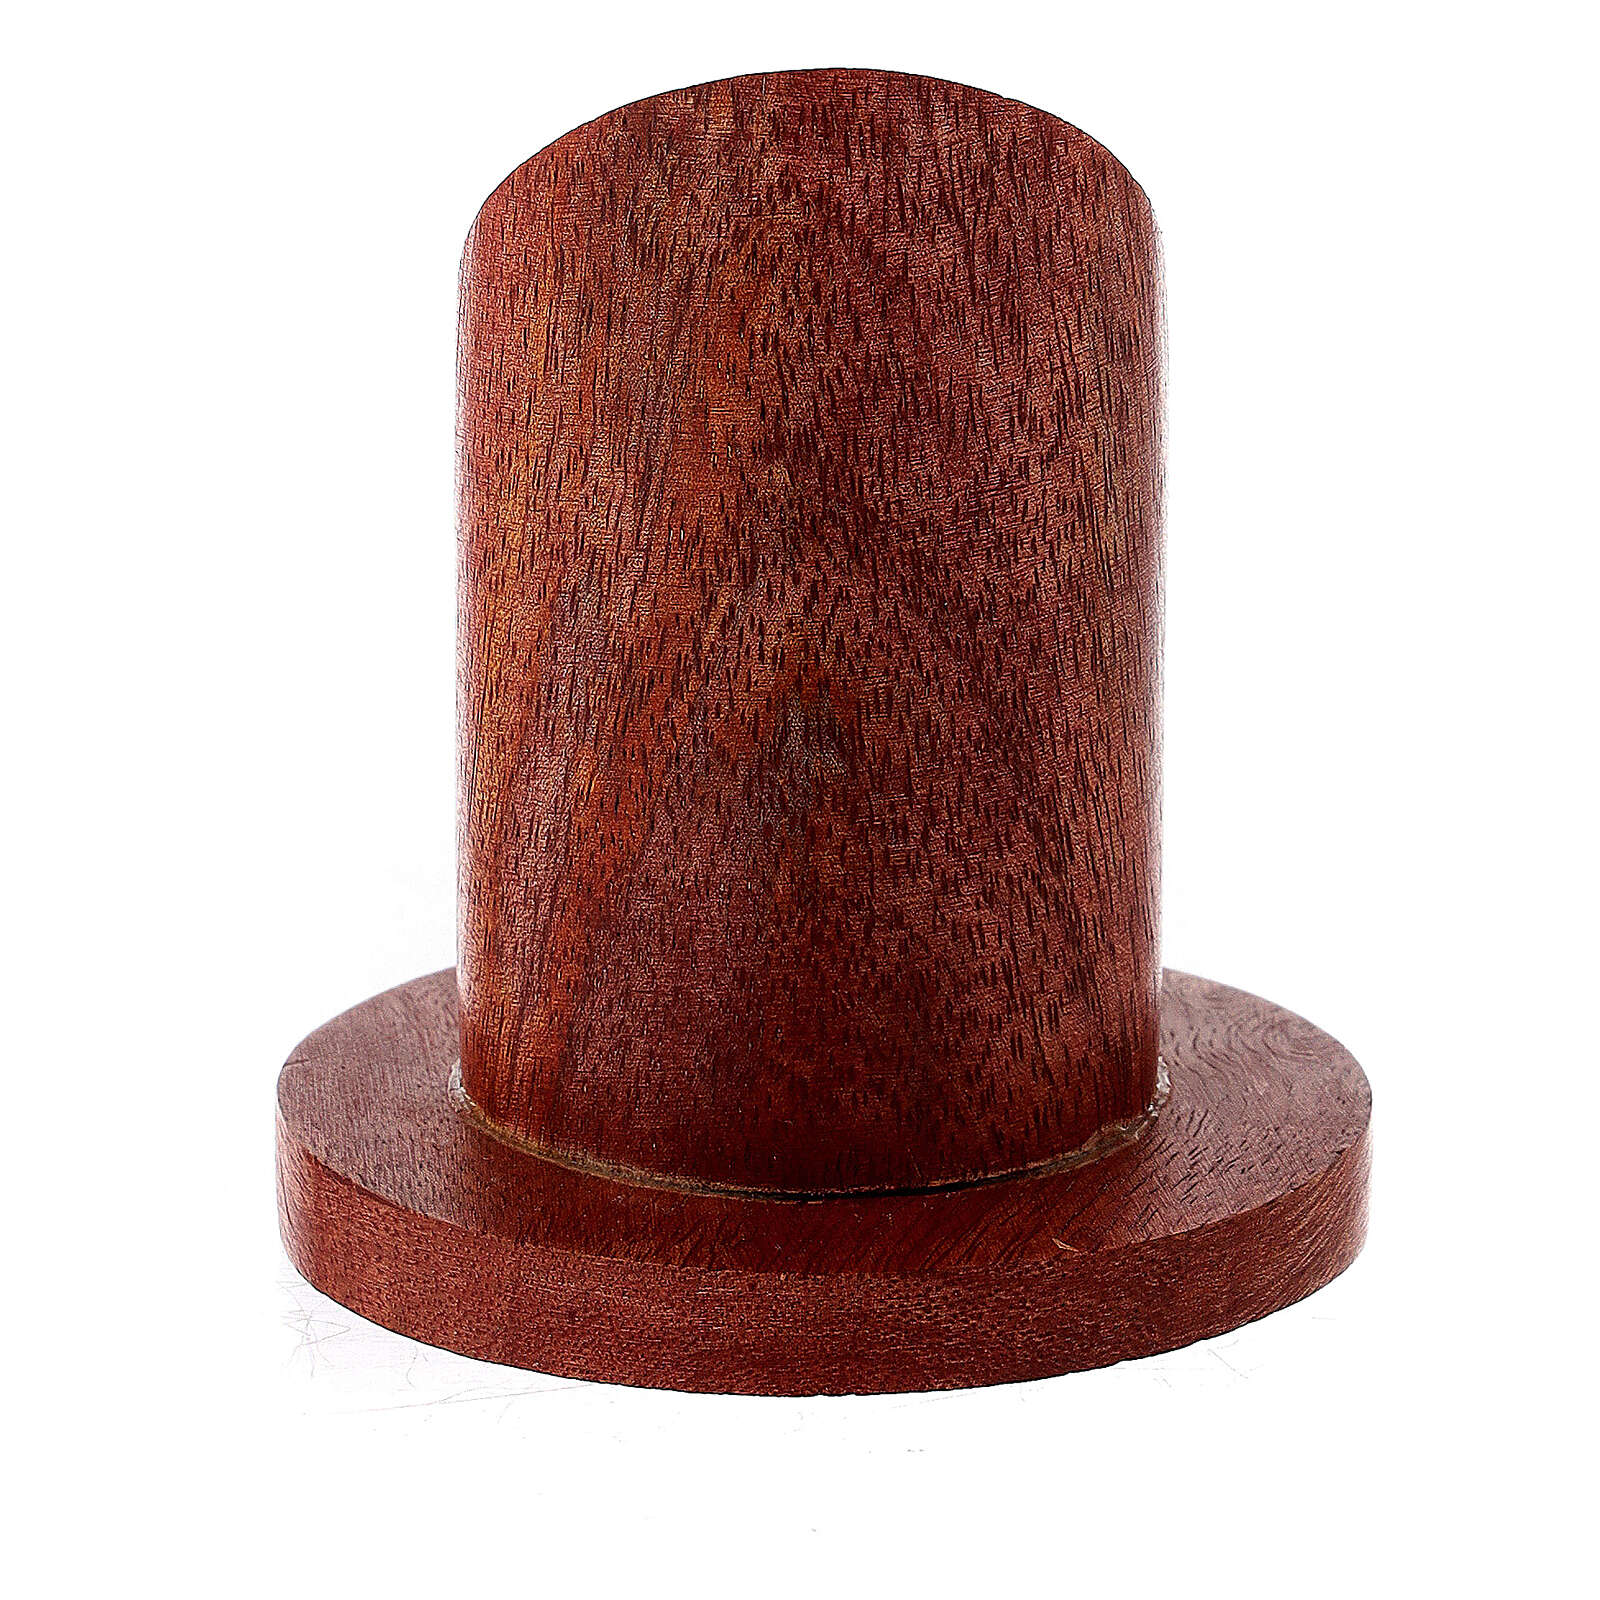 Base portacandela legno mango scuro 3 cm 3